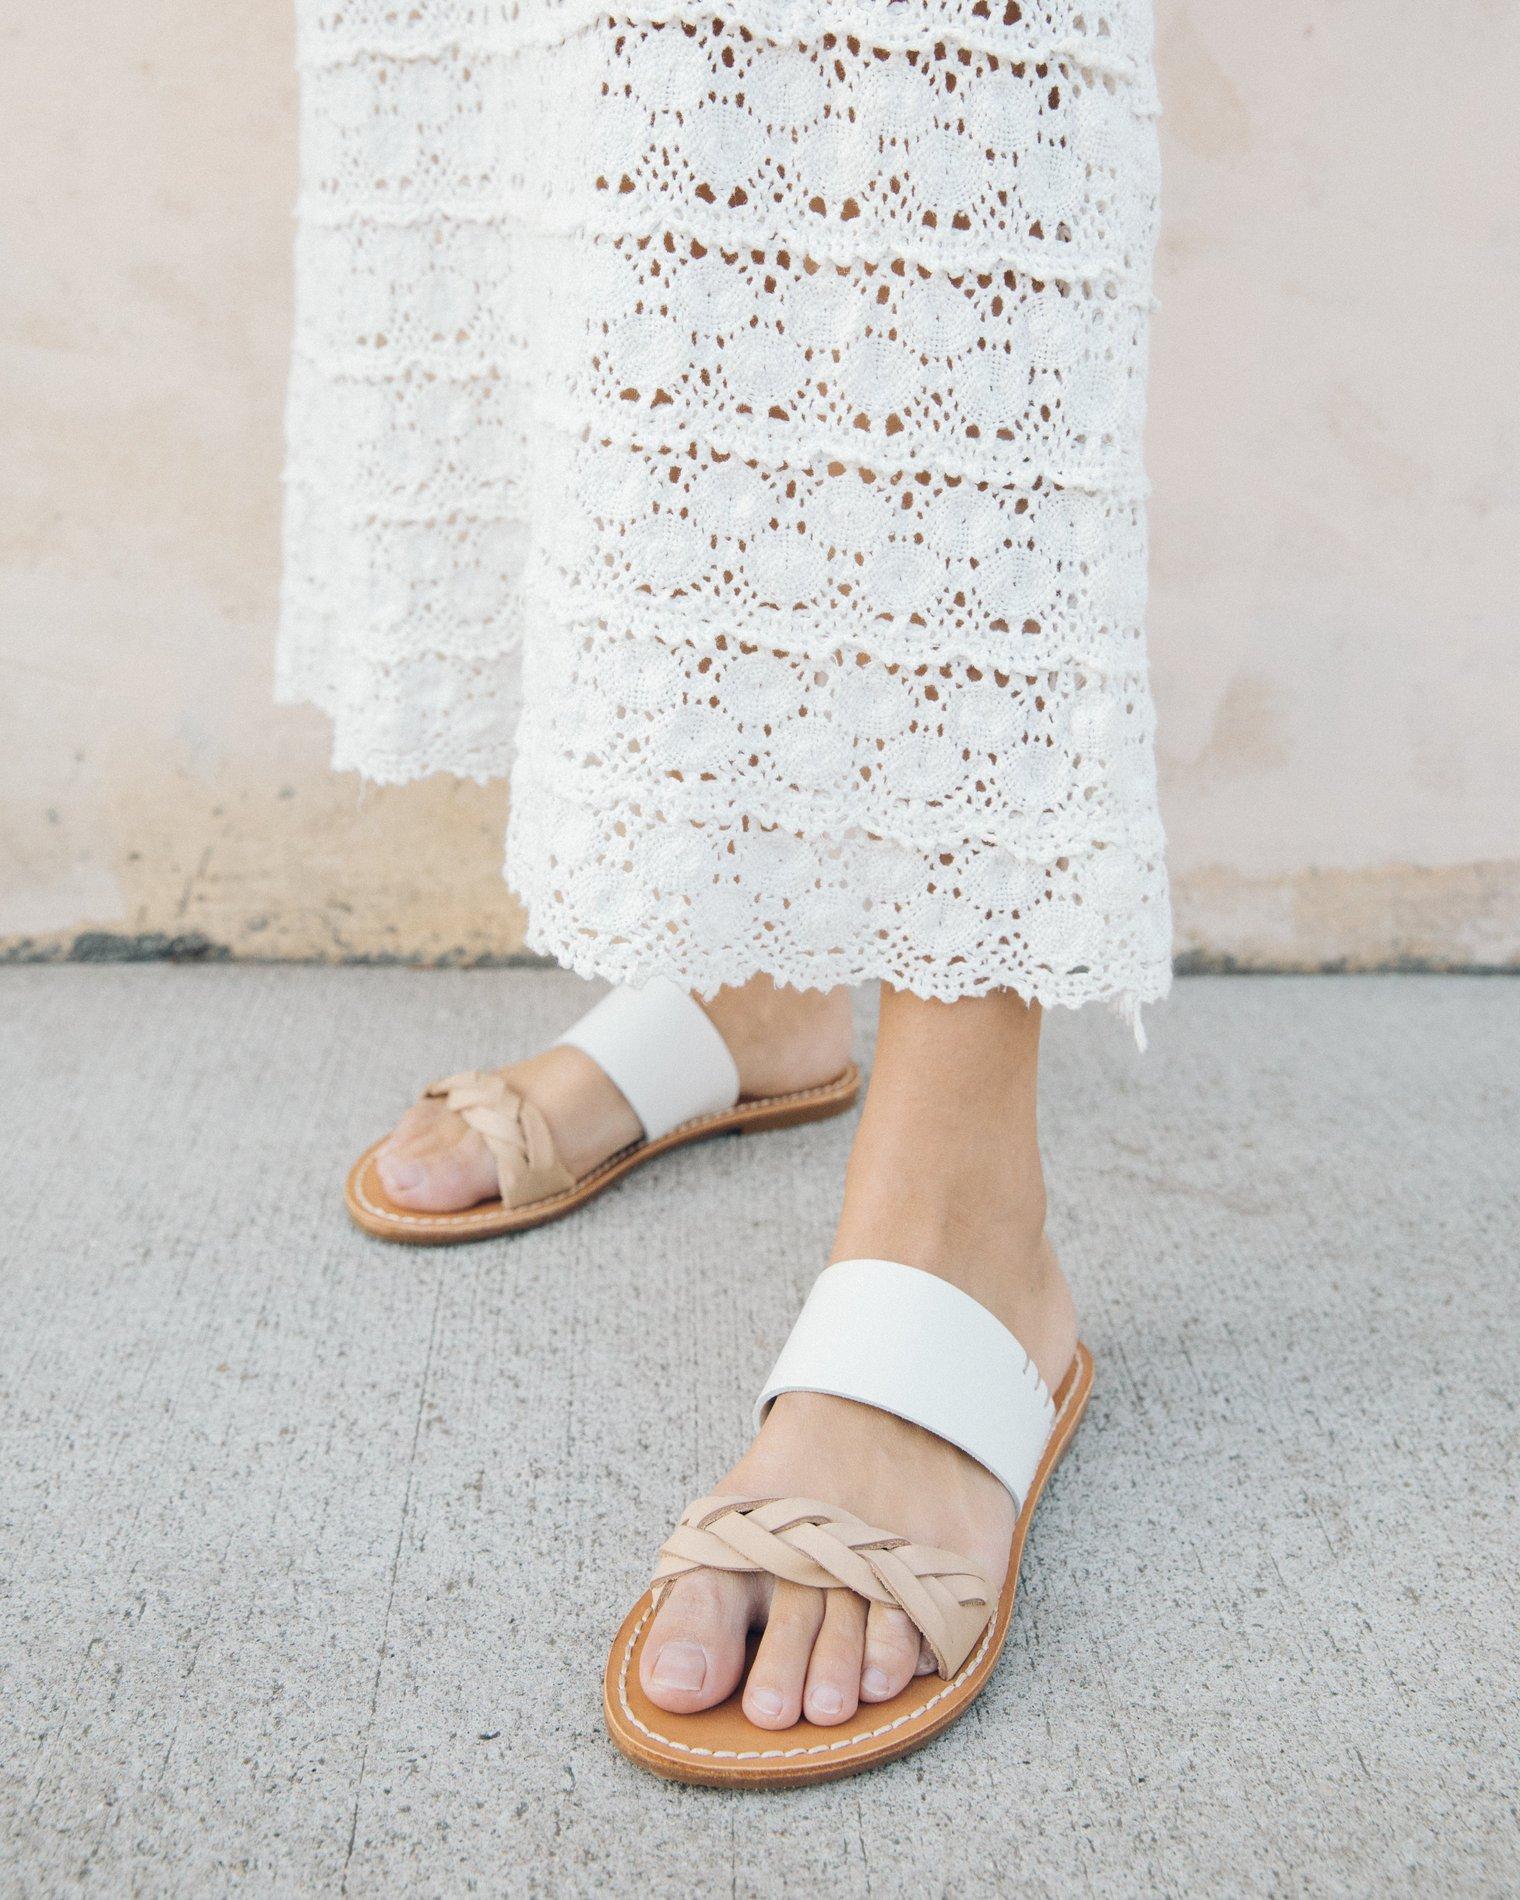 Strappy Flat Sandal Splurge: Soludos